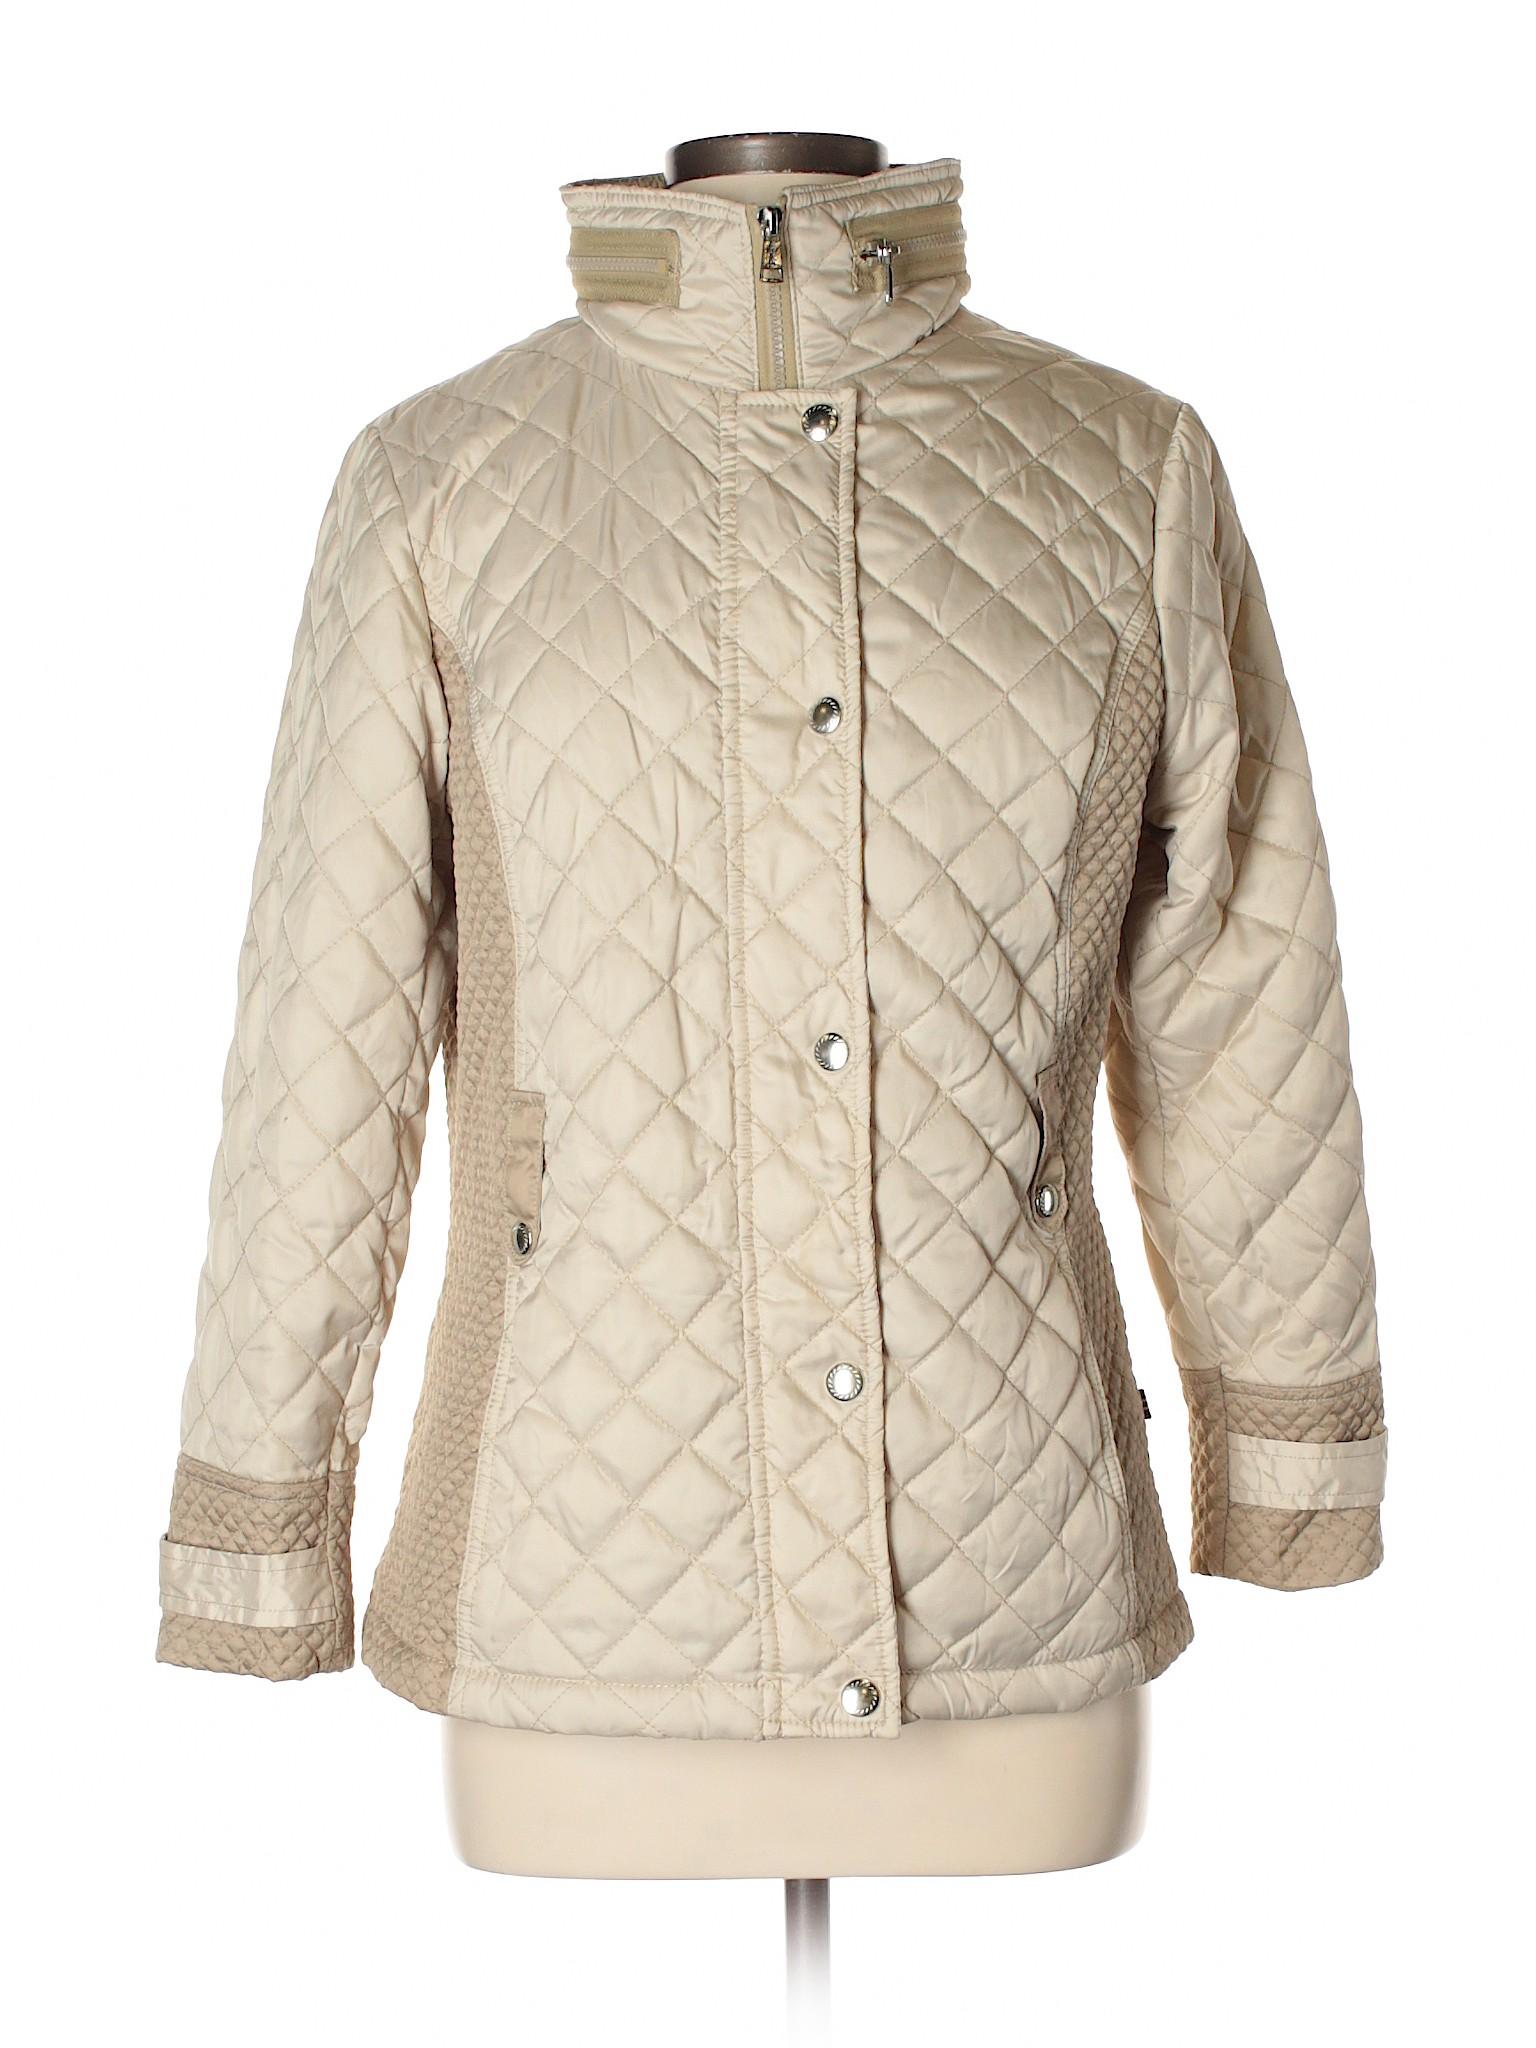 Boutique Jacket Nautica Boutique Jacket Nautica winter winter winter Boutique Nautica Boutique Jacket awxffBCgd